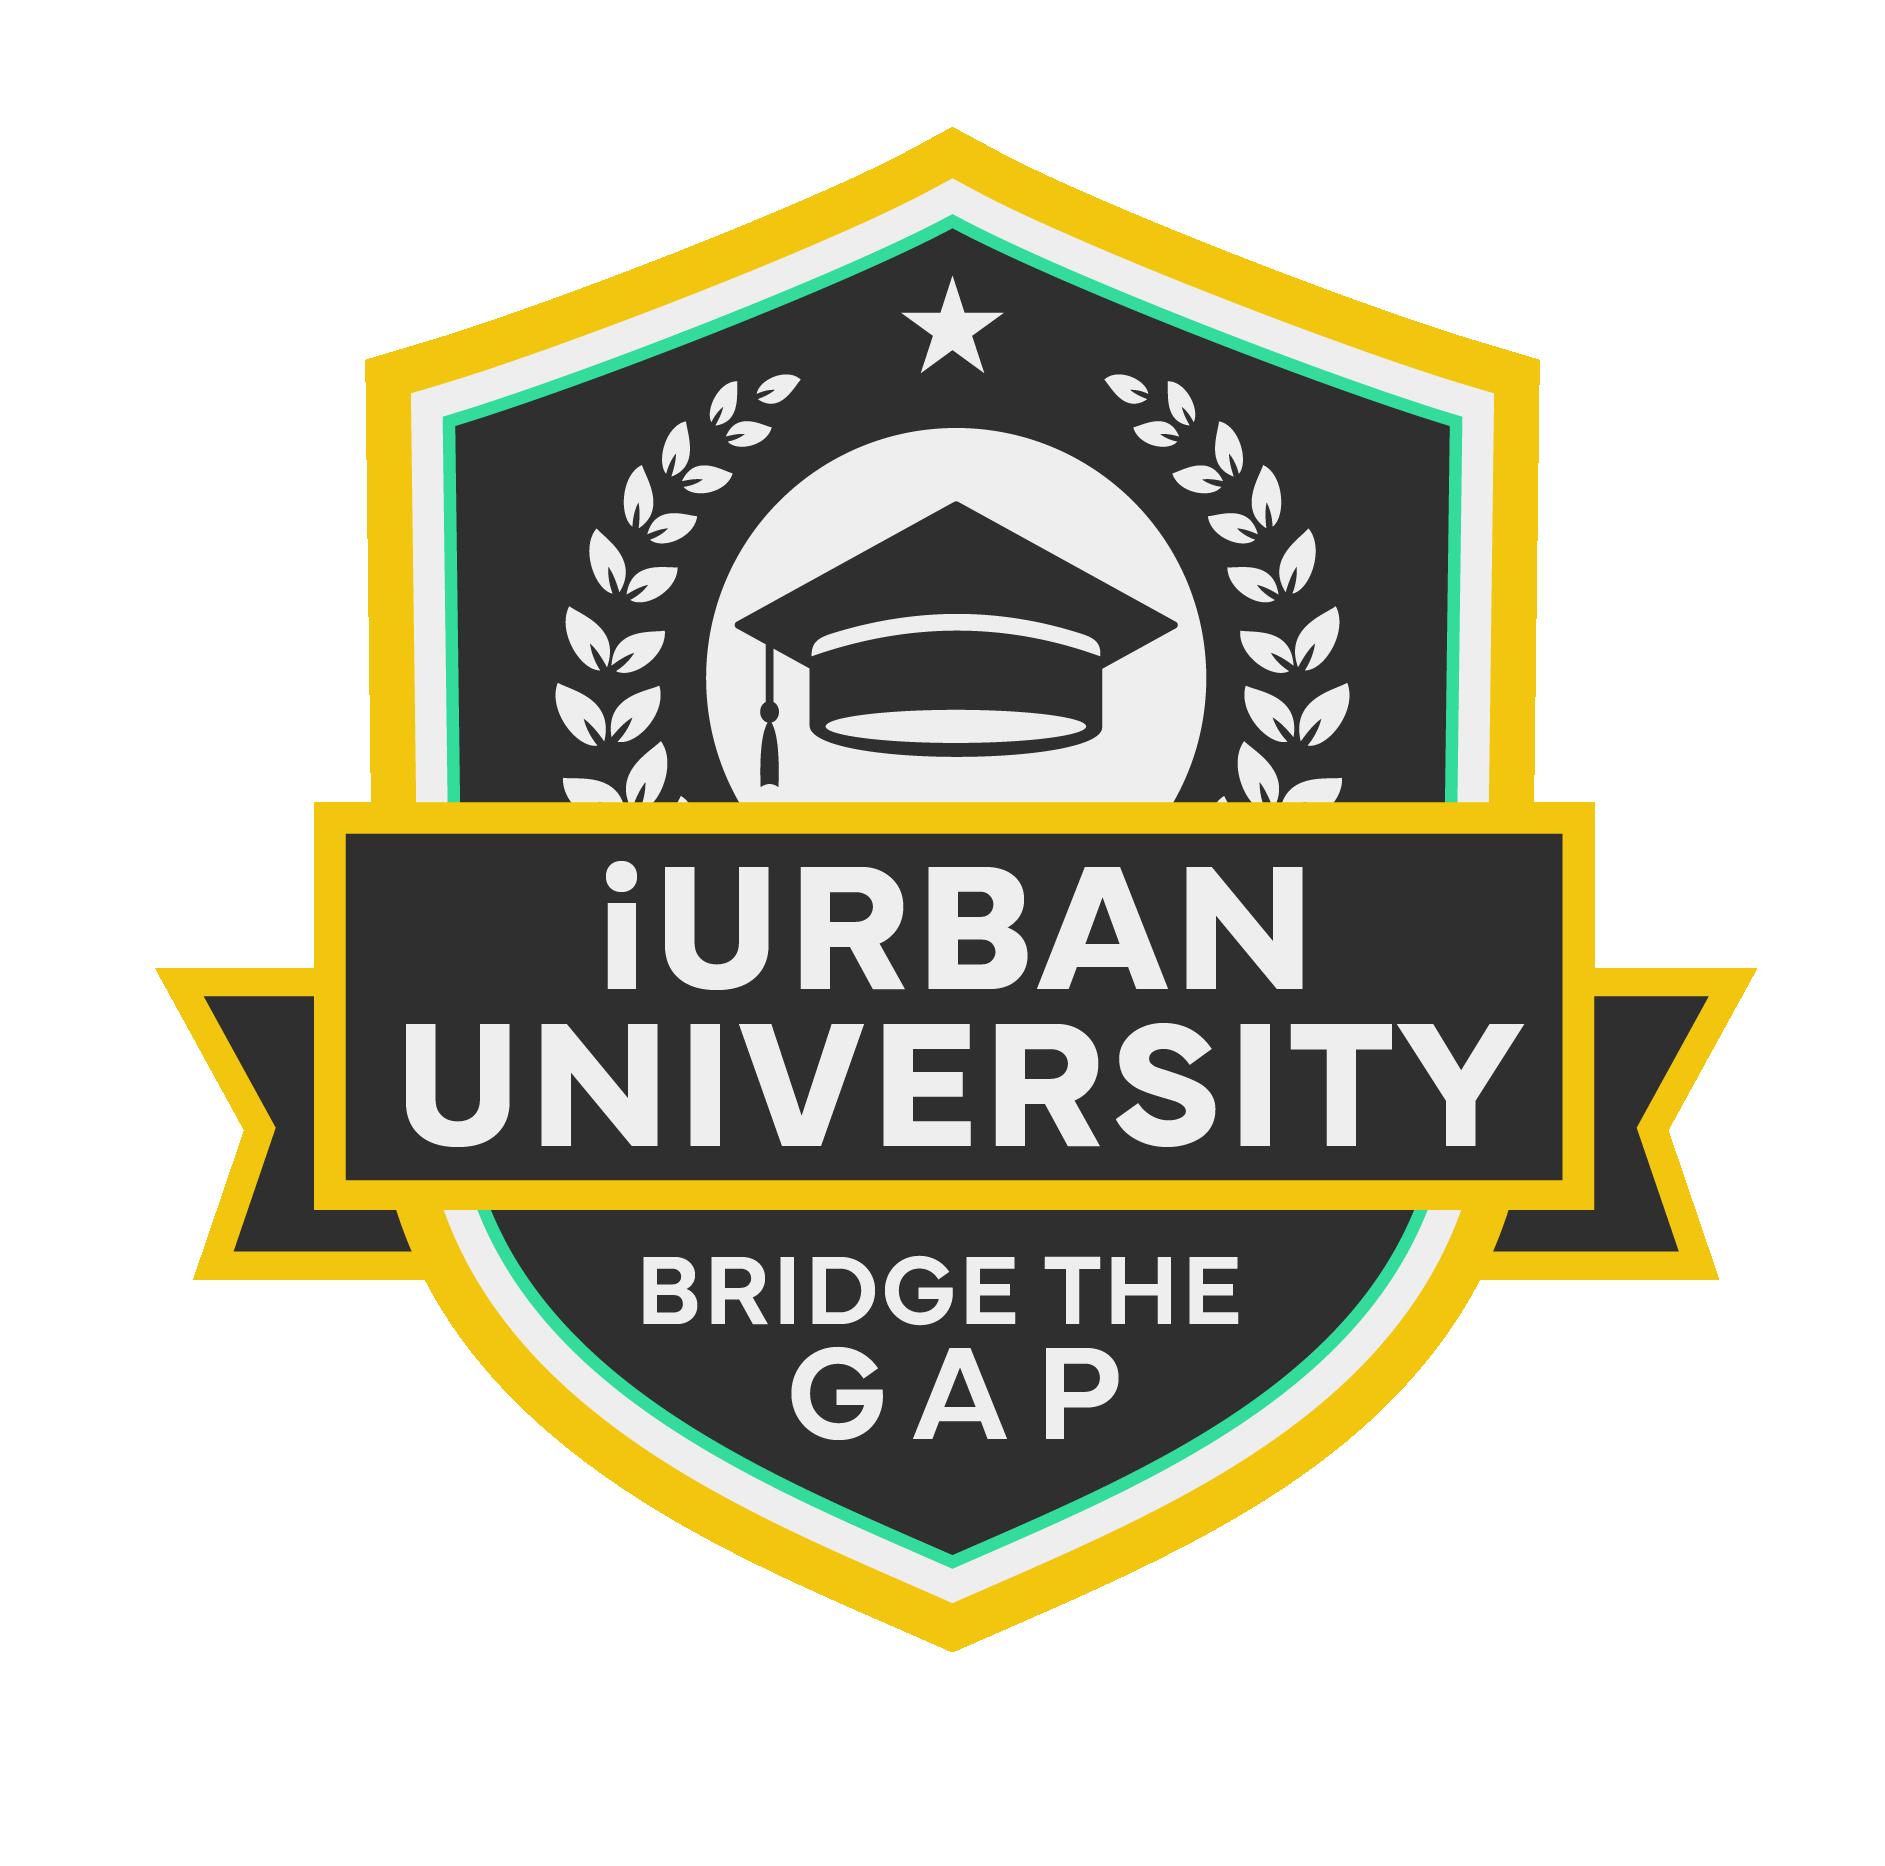 iUrban University